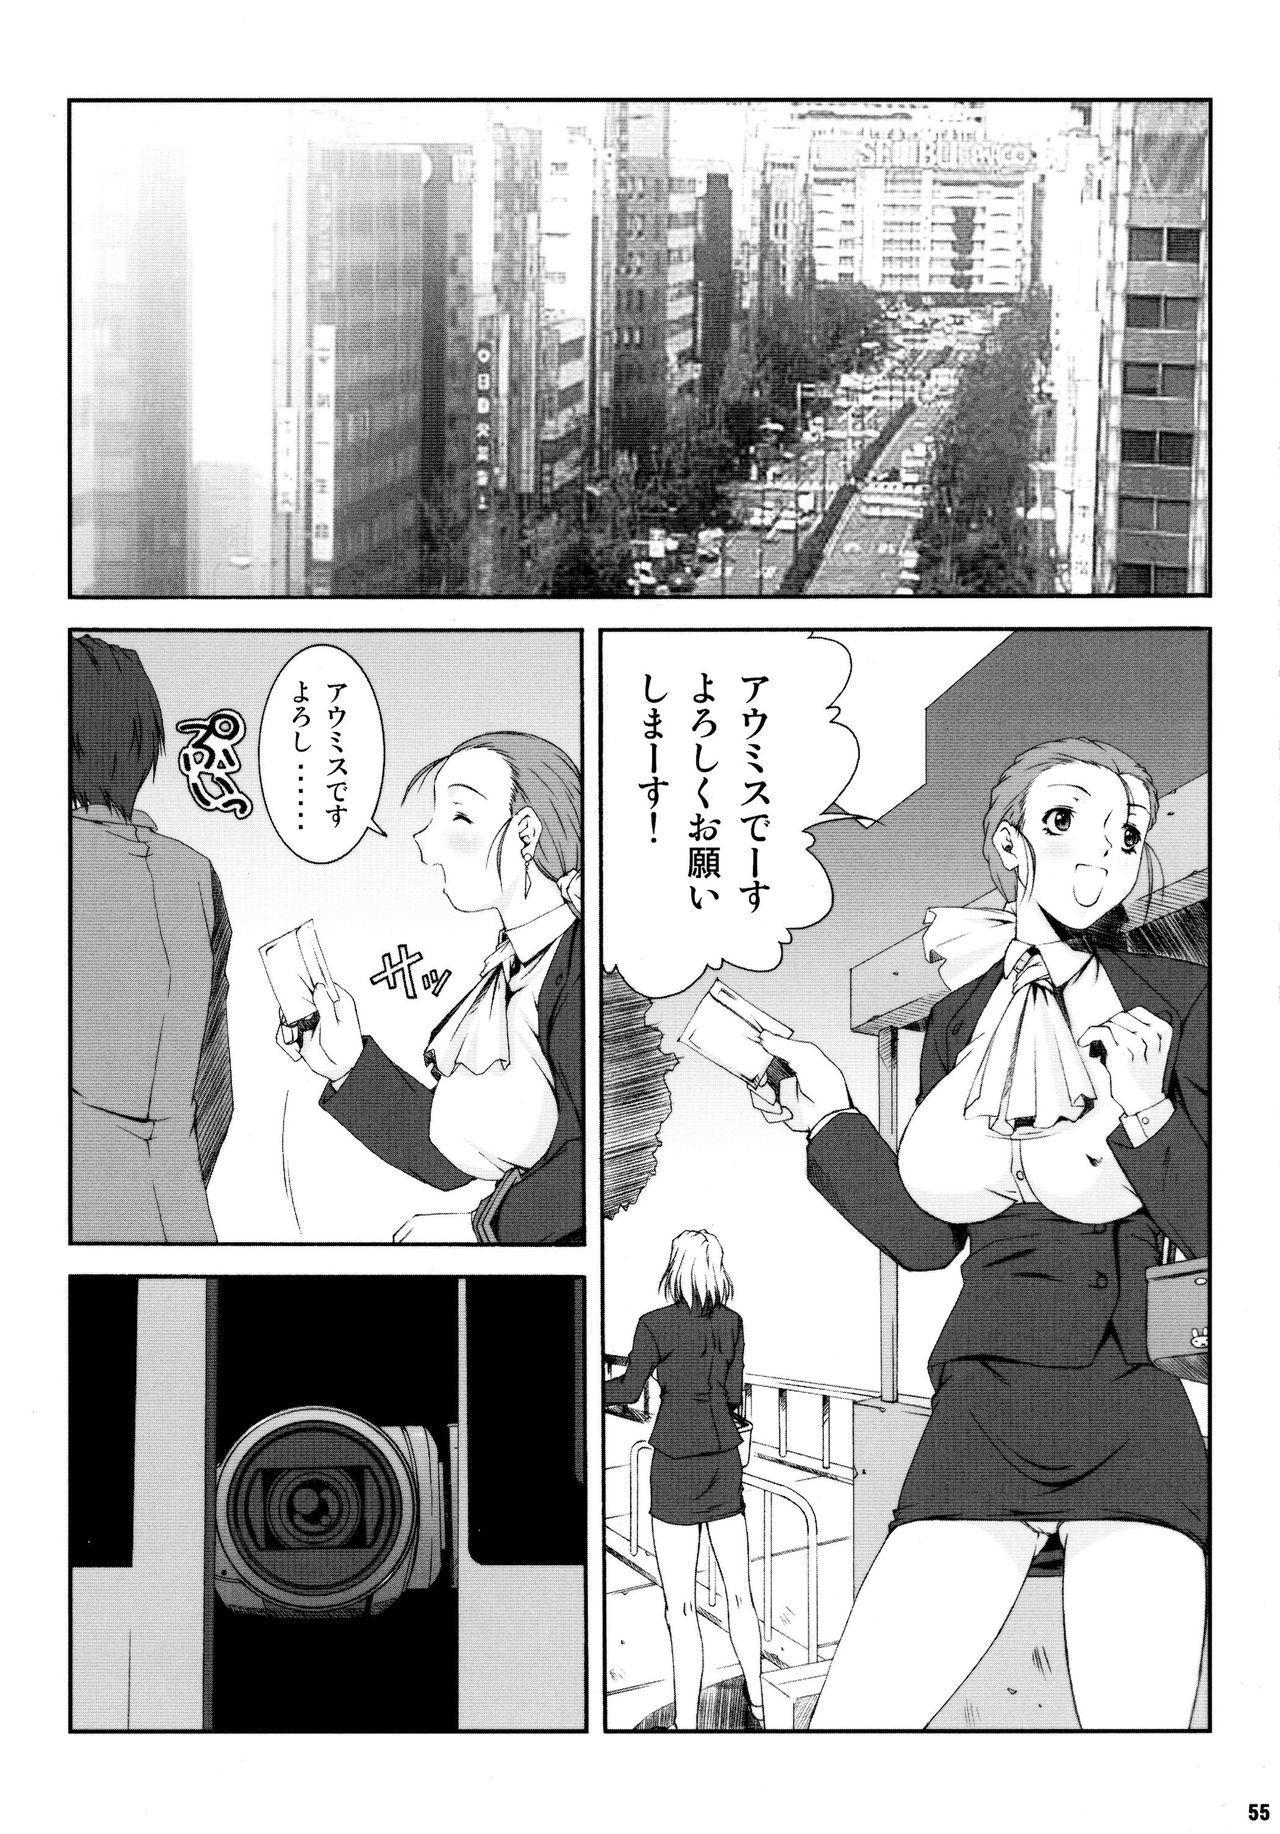 Misoka no 5 54